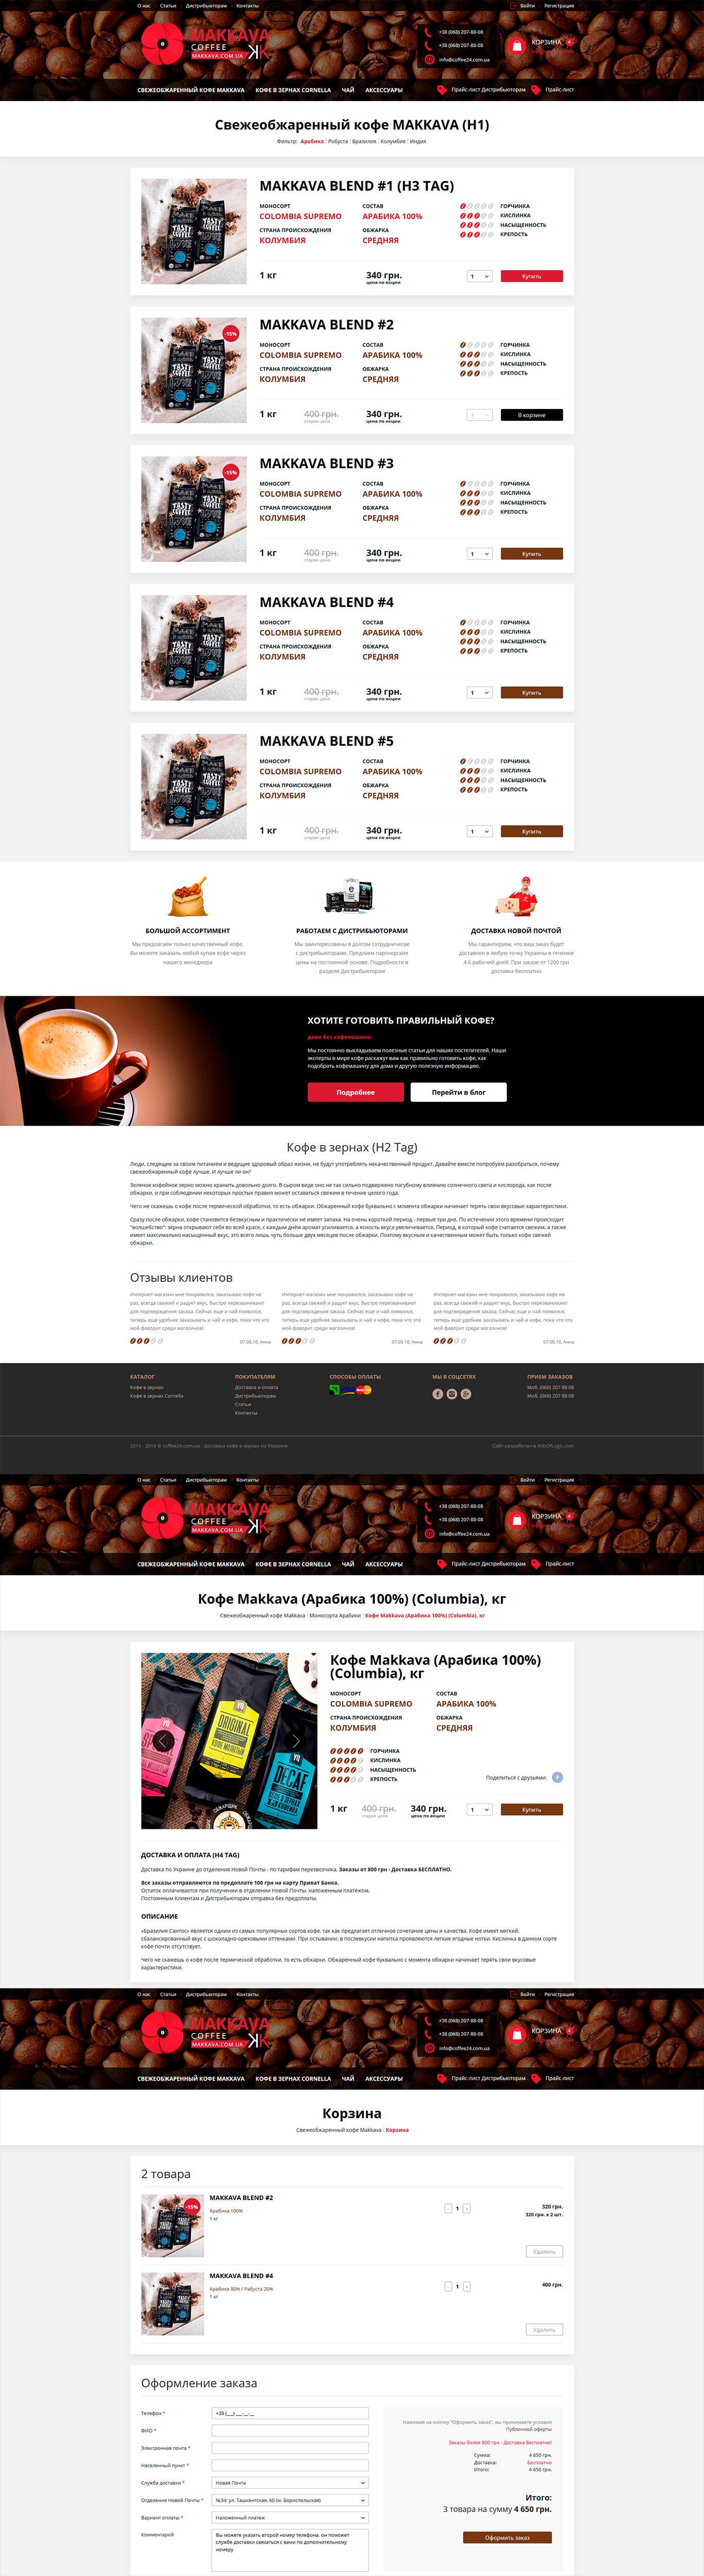 Интернет-магазин кофе